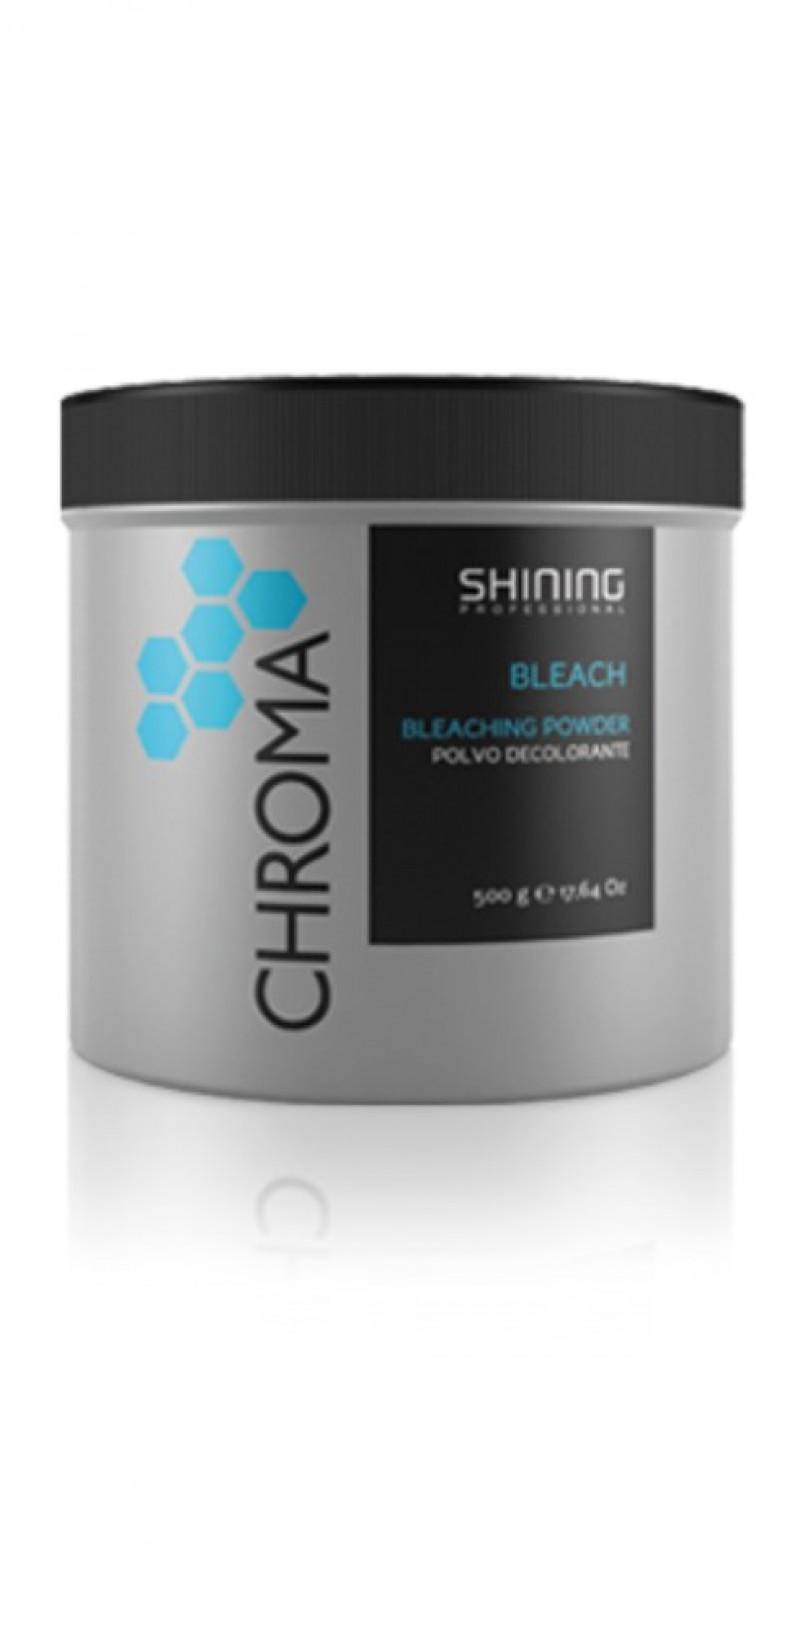 Decoloracion Shining Chroma Bleach 500grs